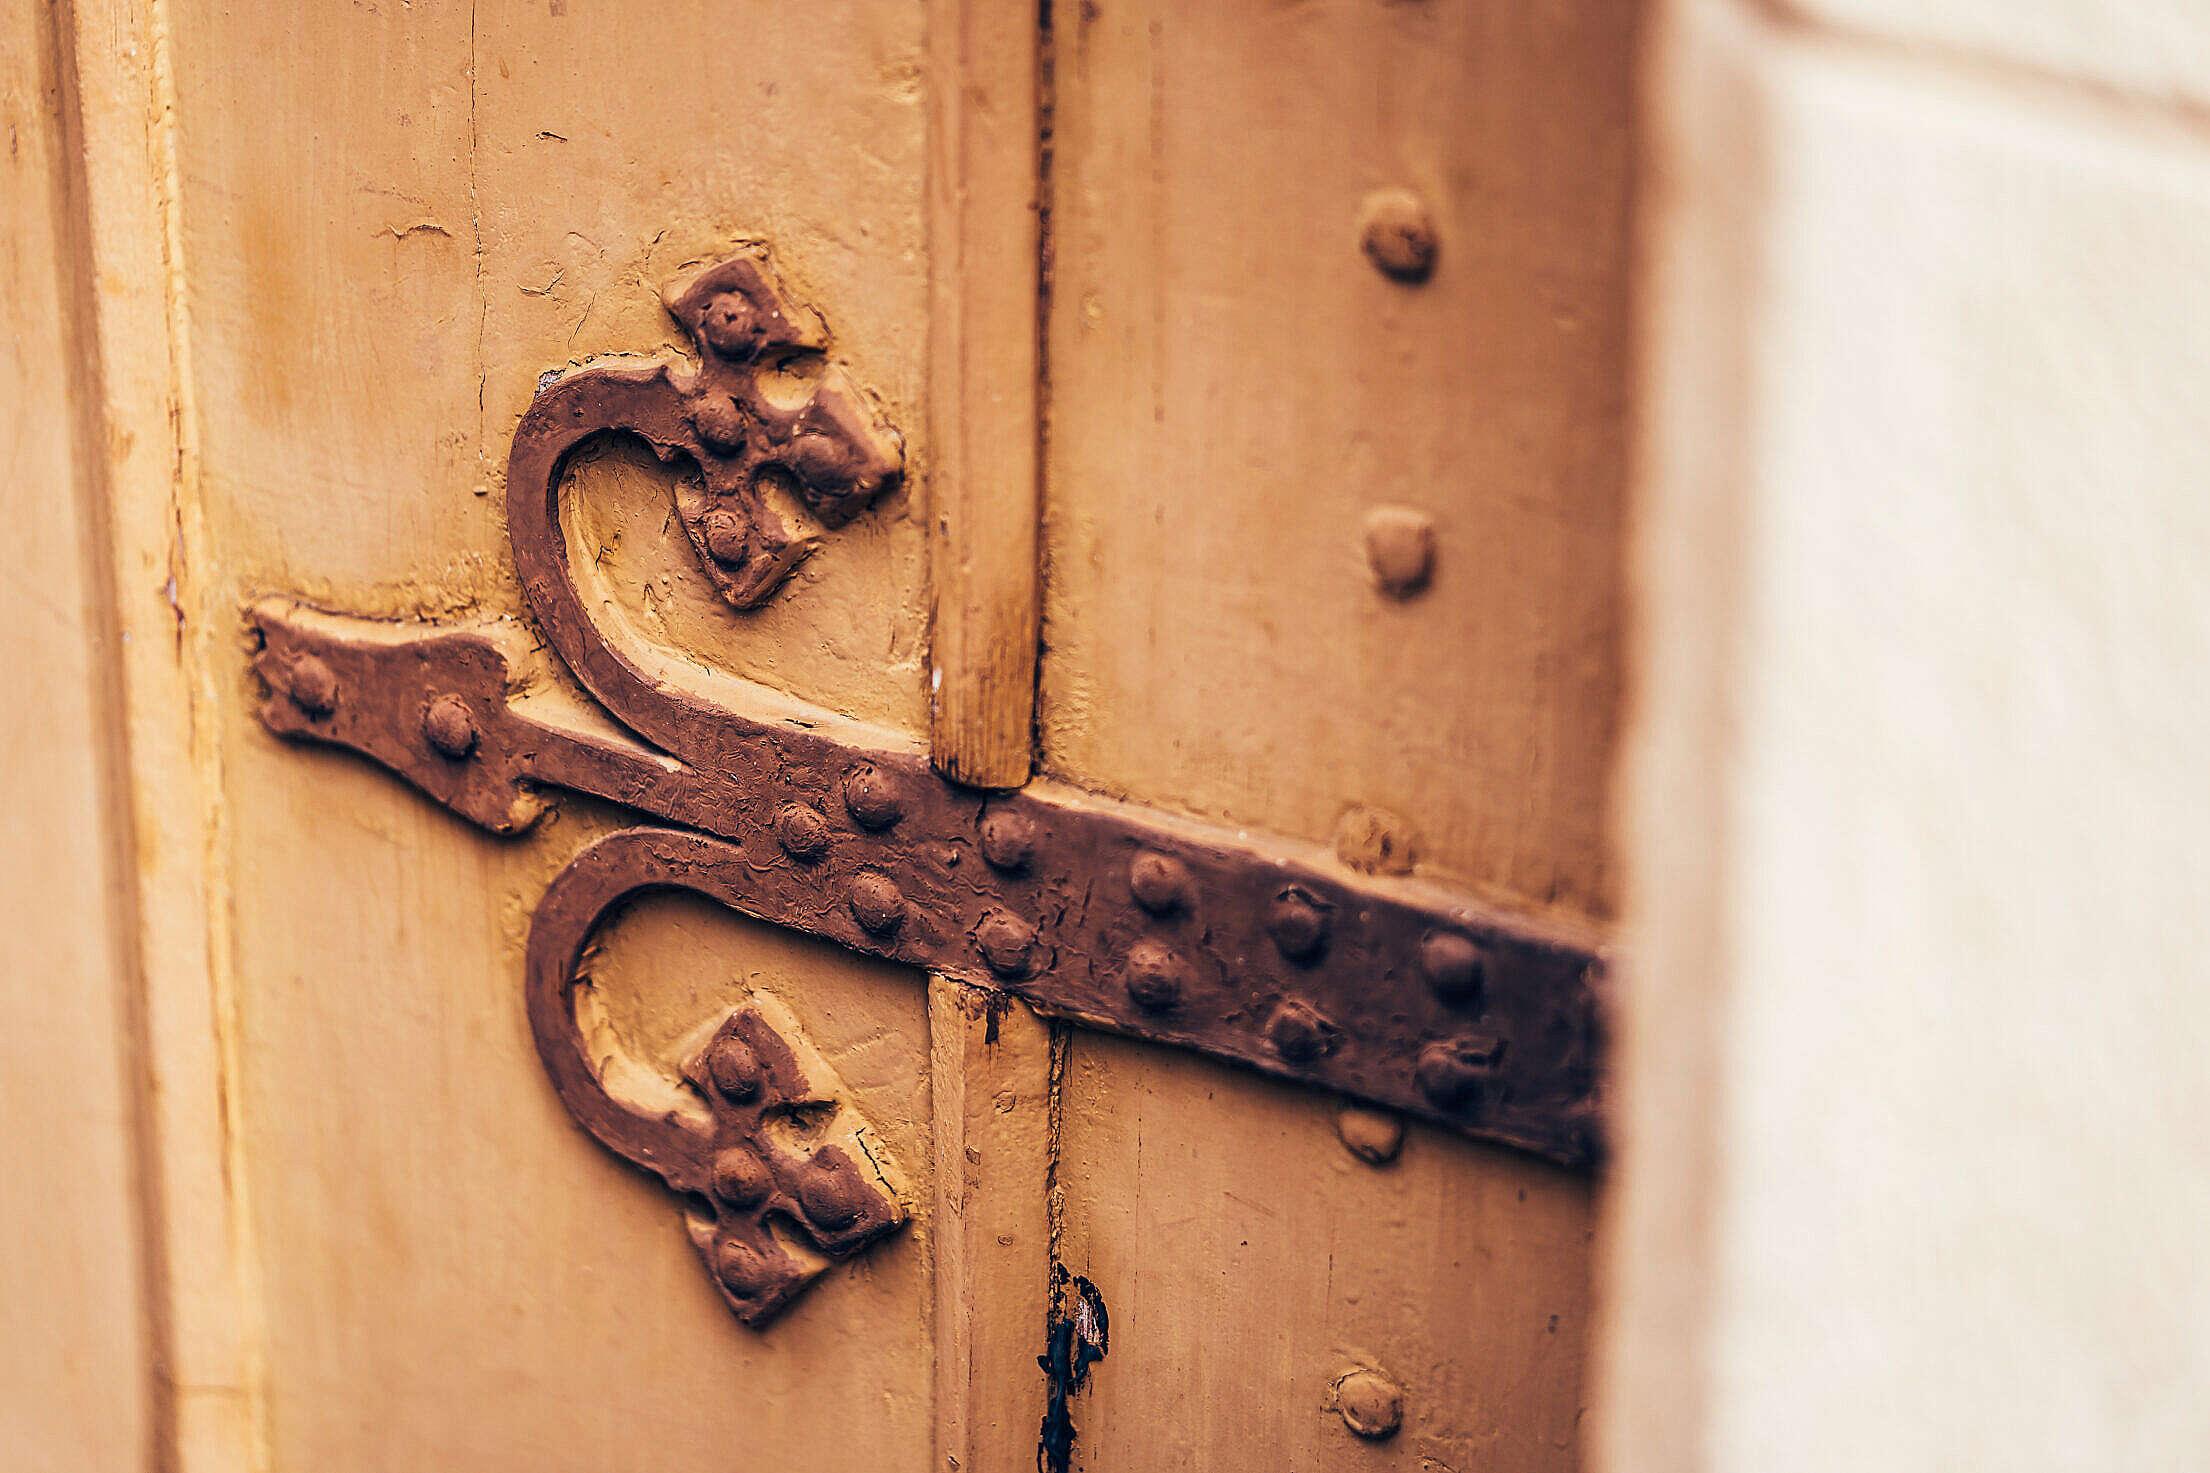 Old Antique Door Decorative Details Free Stock Photo